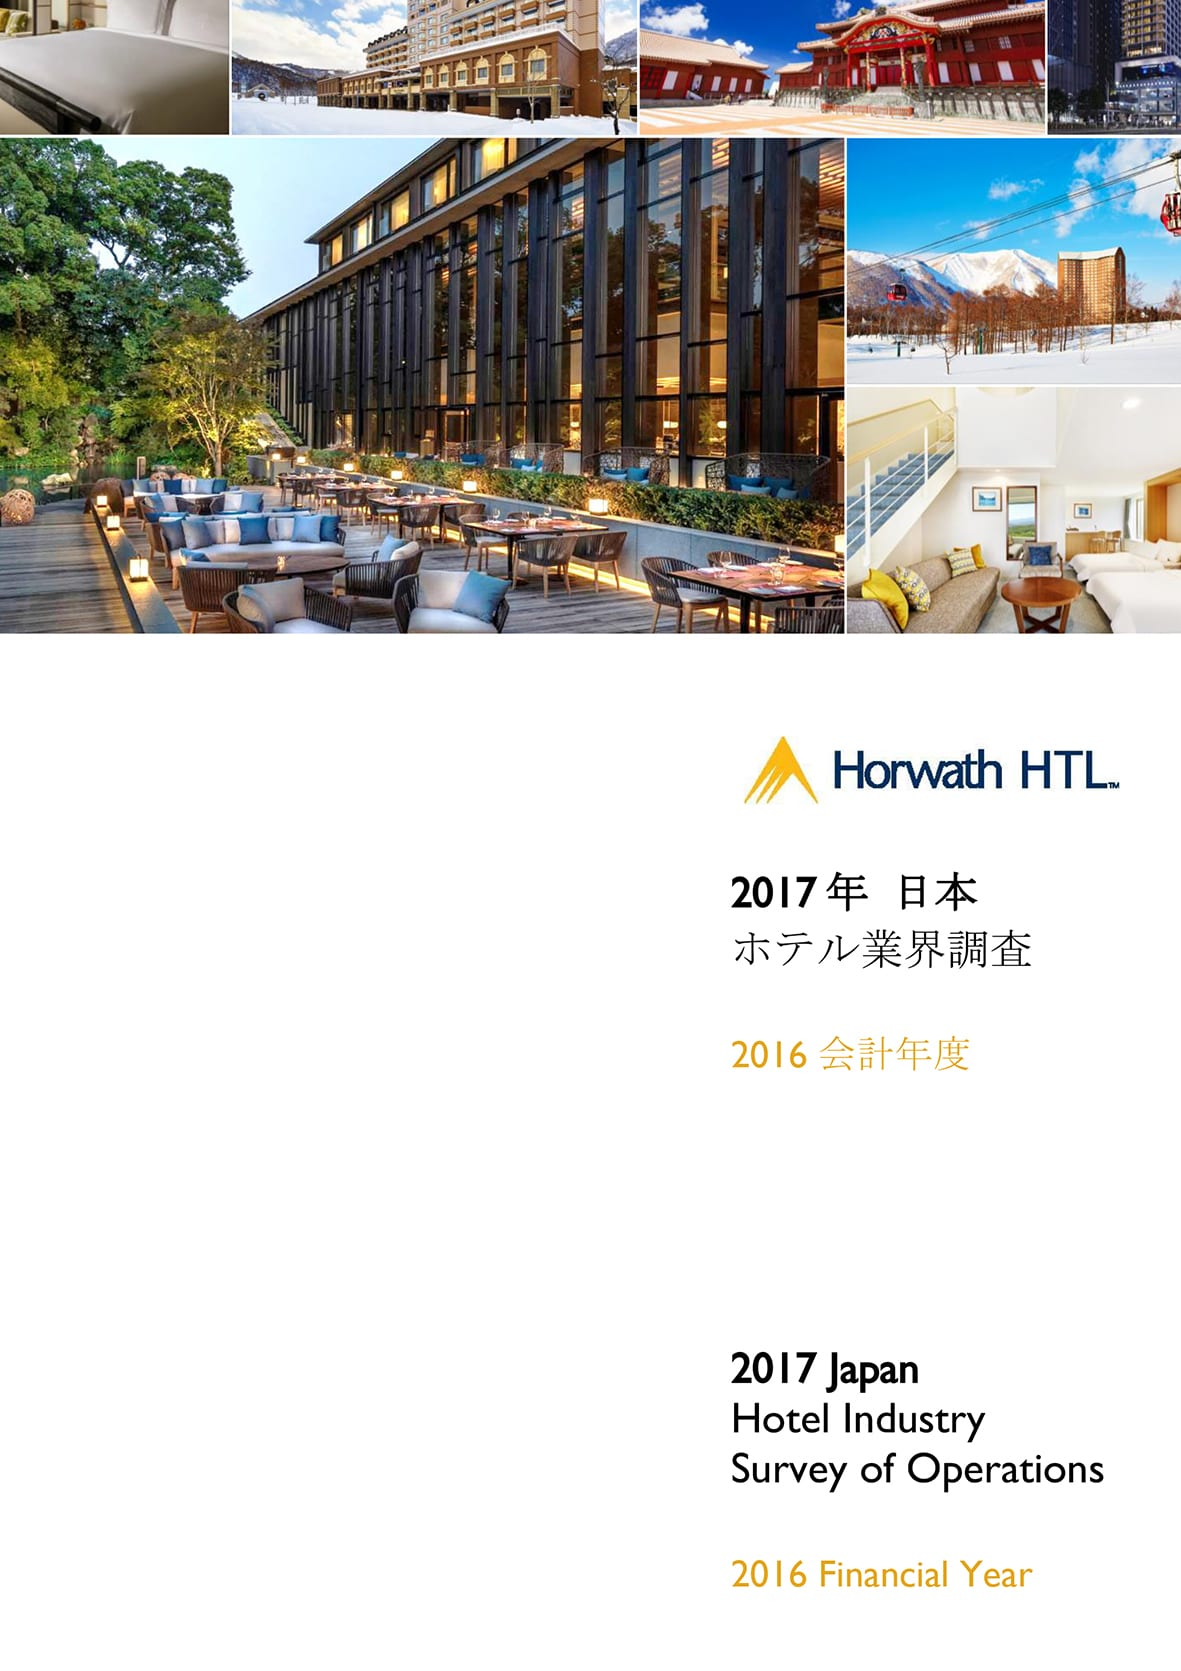 HHTL Annual Study 2017 Japan 2